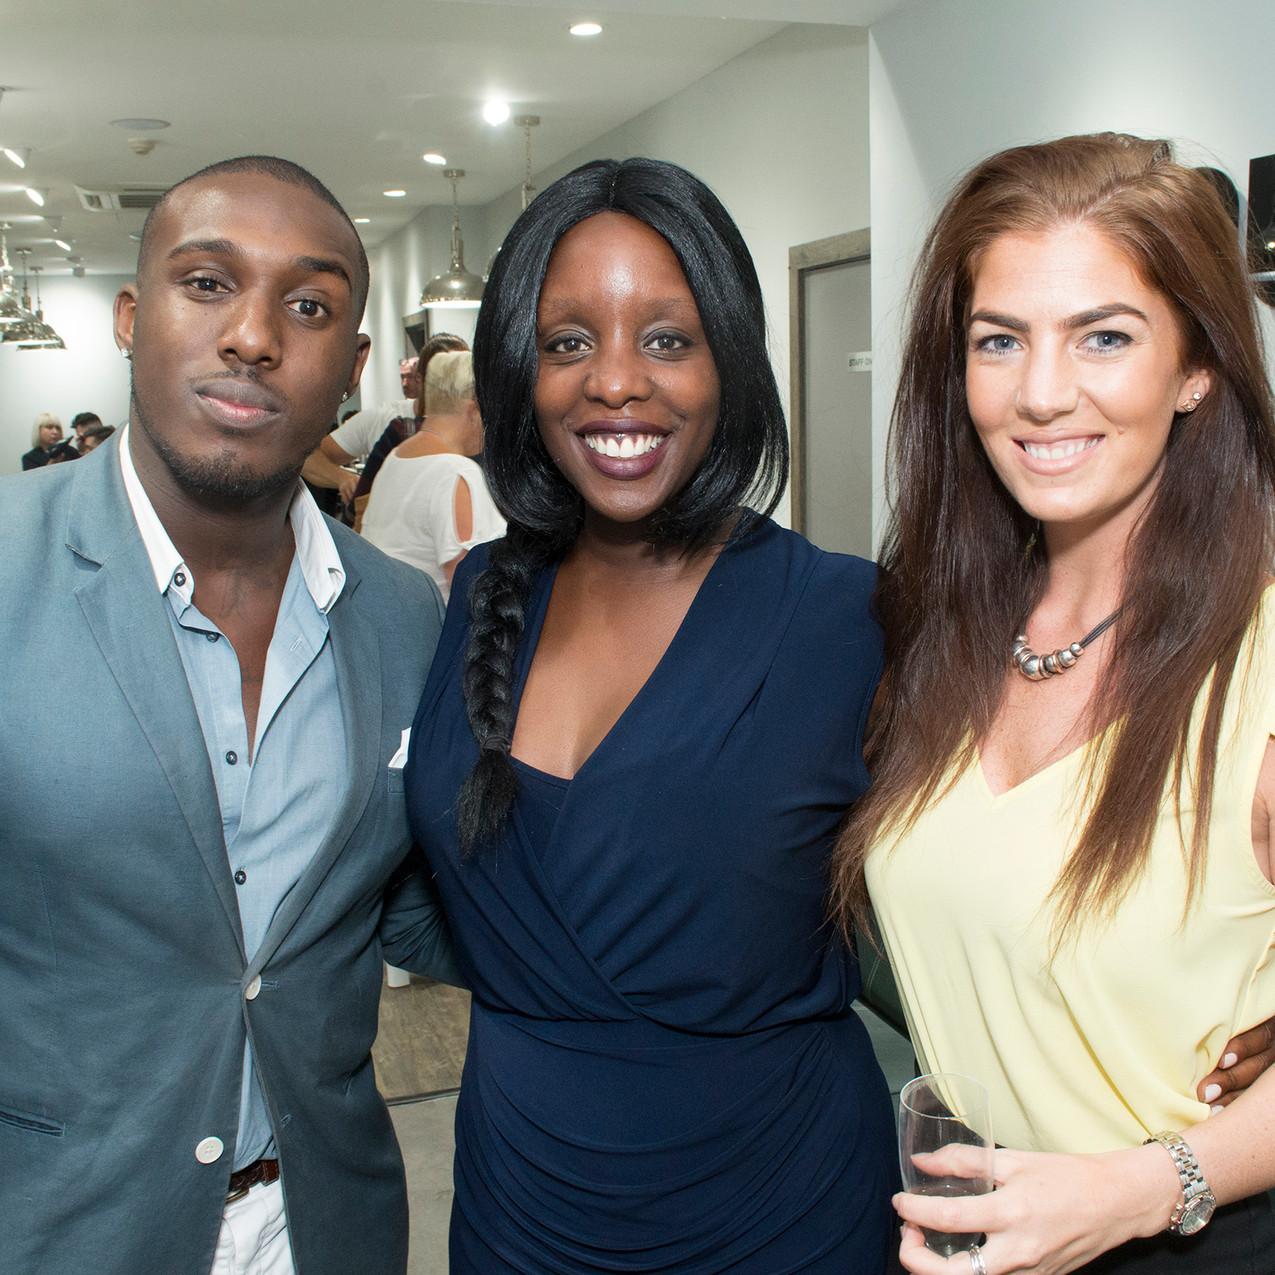 Selfridges Personal Shopper Aaron Archer with Denise Morris, Chrissie Wolfe